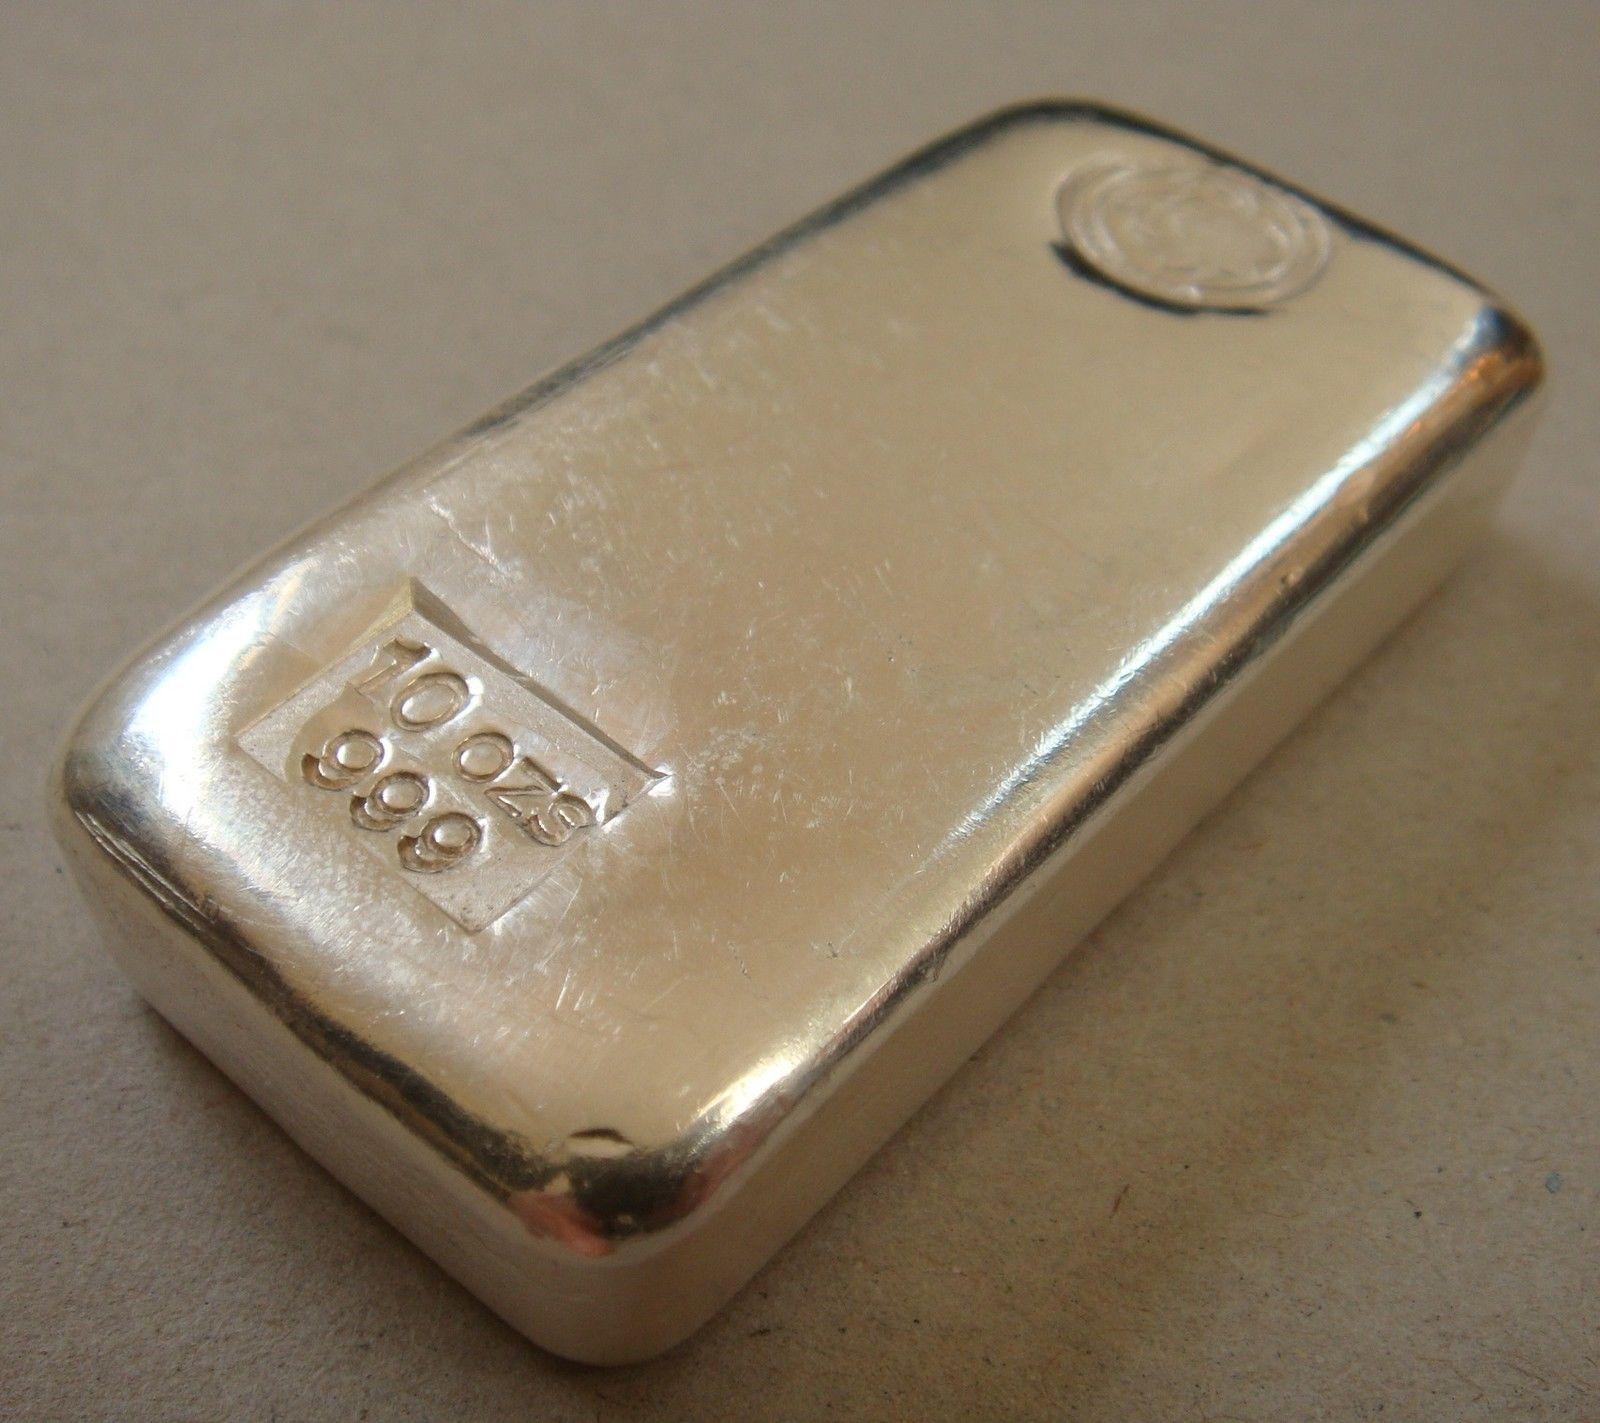 Perth Mint 10 Oz 999 Silver Bullion Bar Gold Bullion Silver Bullion Gold Bullion Bars